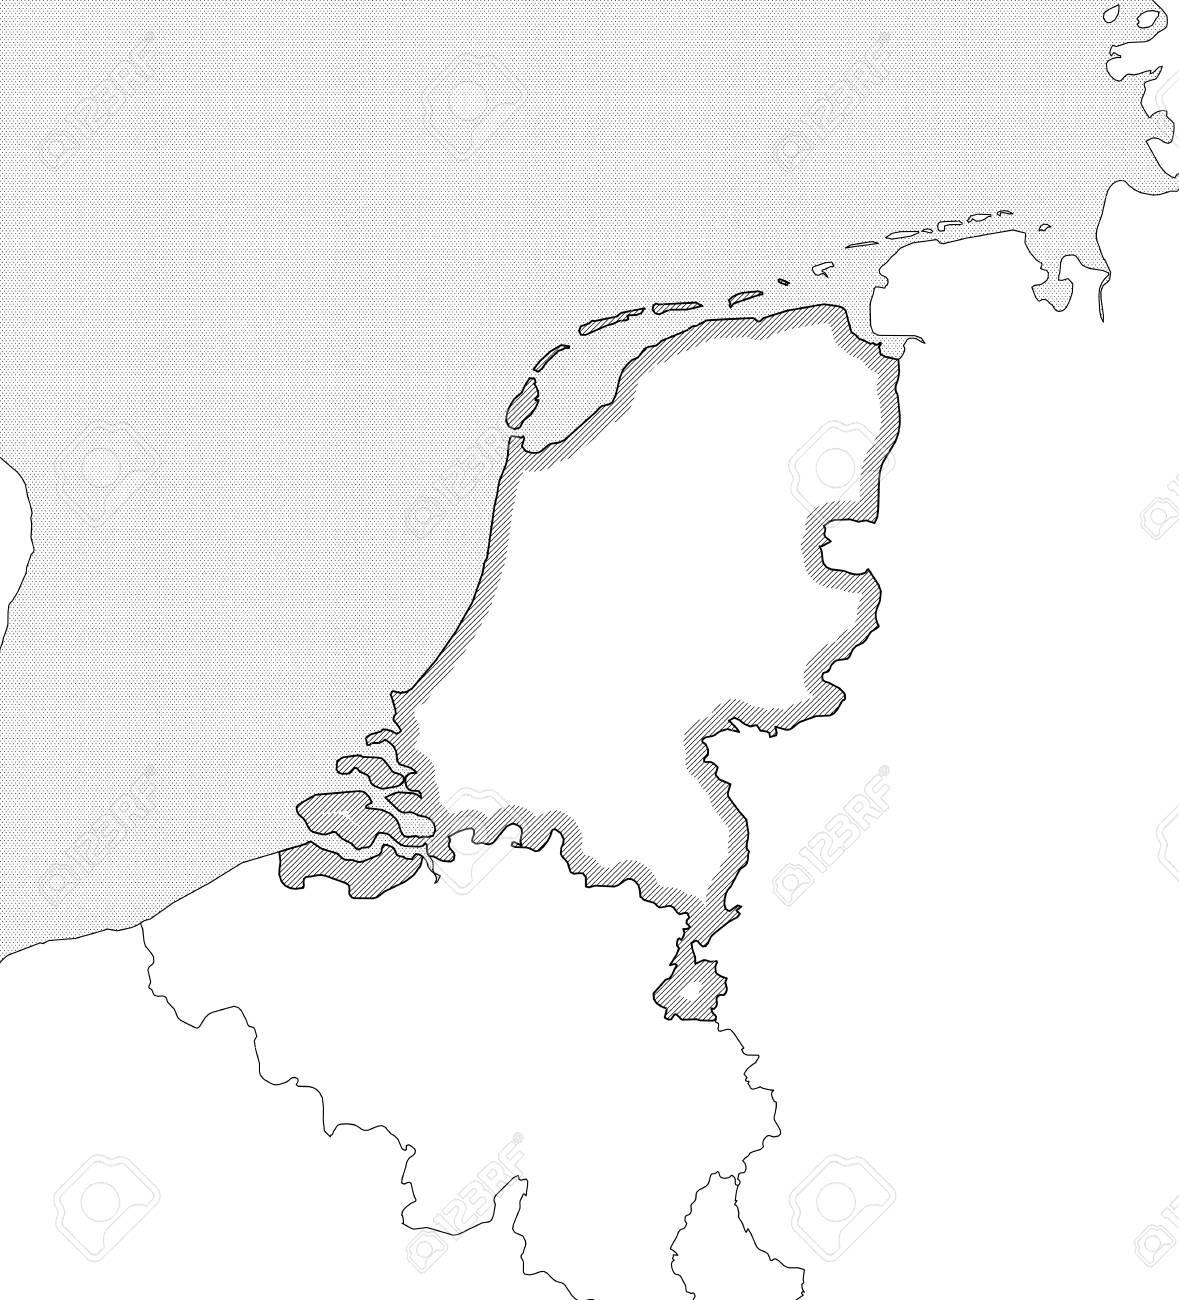 Niederlande Karte Umriss.Stock Photo